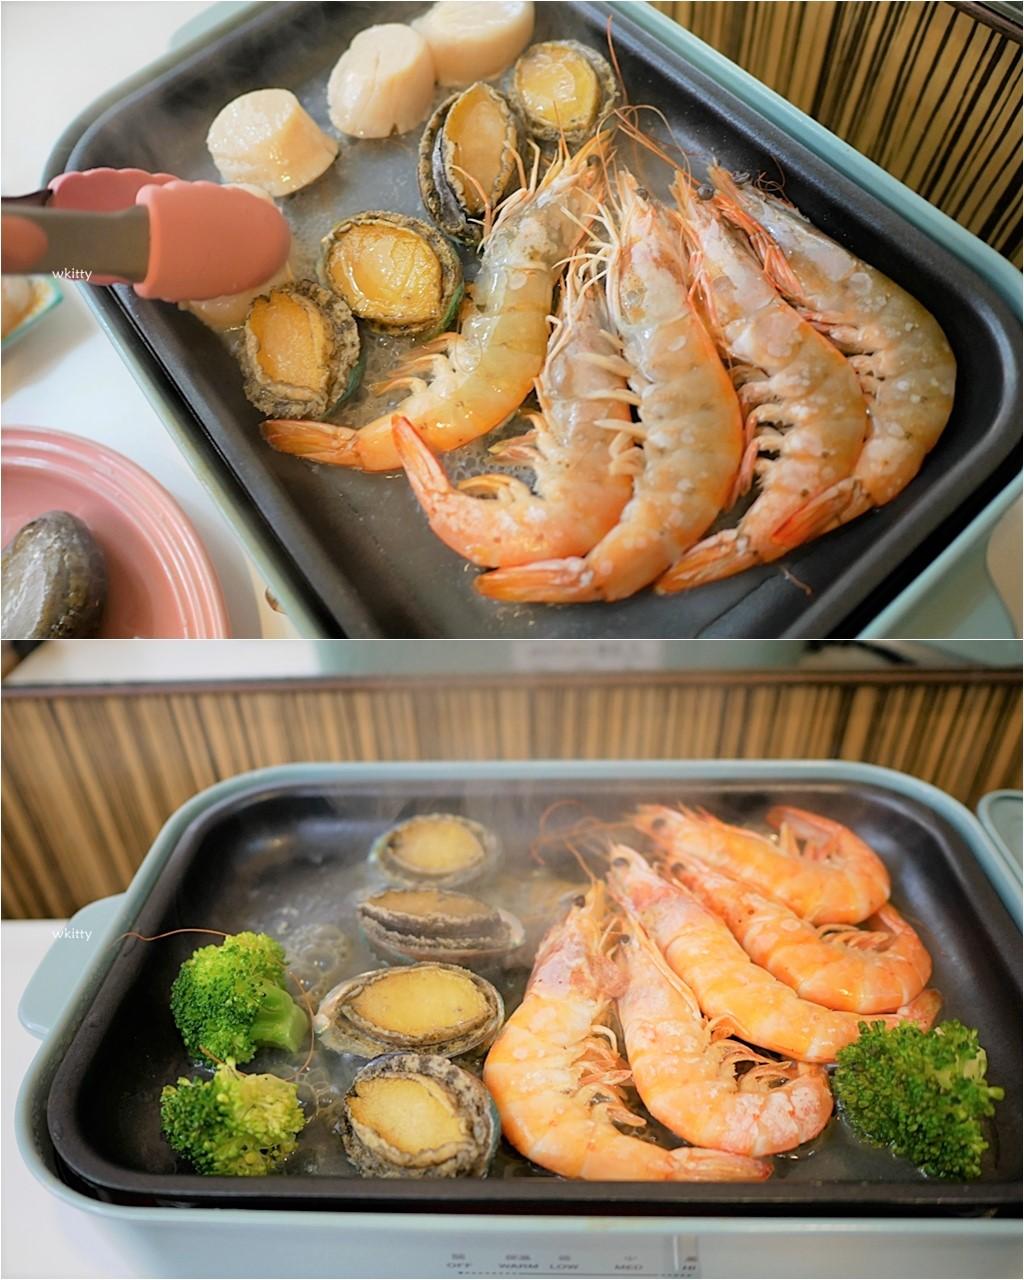 【BRUNO電烤盤團購】0廚藝也可以變化出多種特色料理,你一定要擁有的廚房好物! @小環妞 幸福足跡